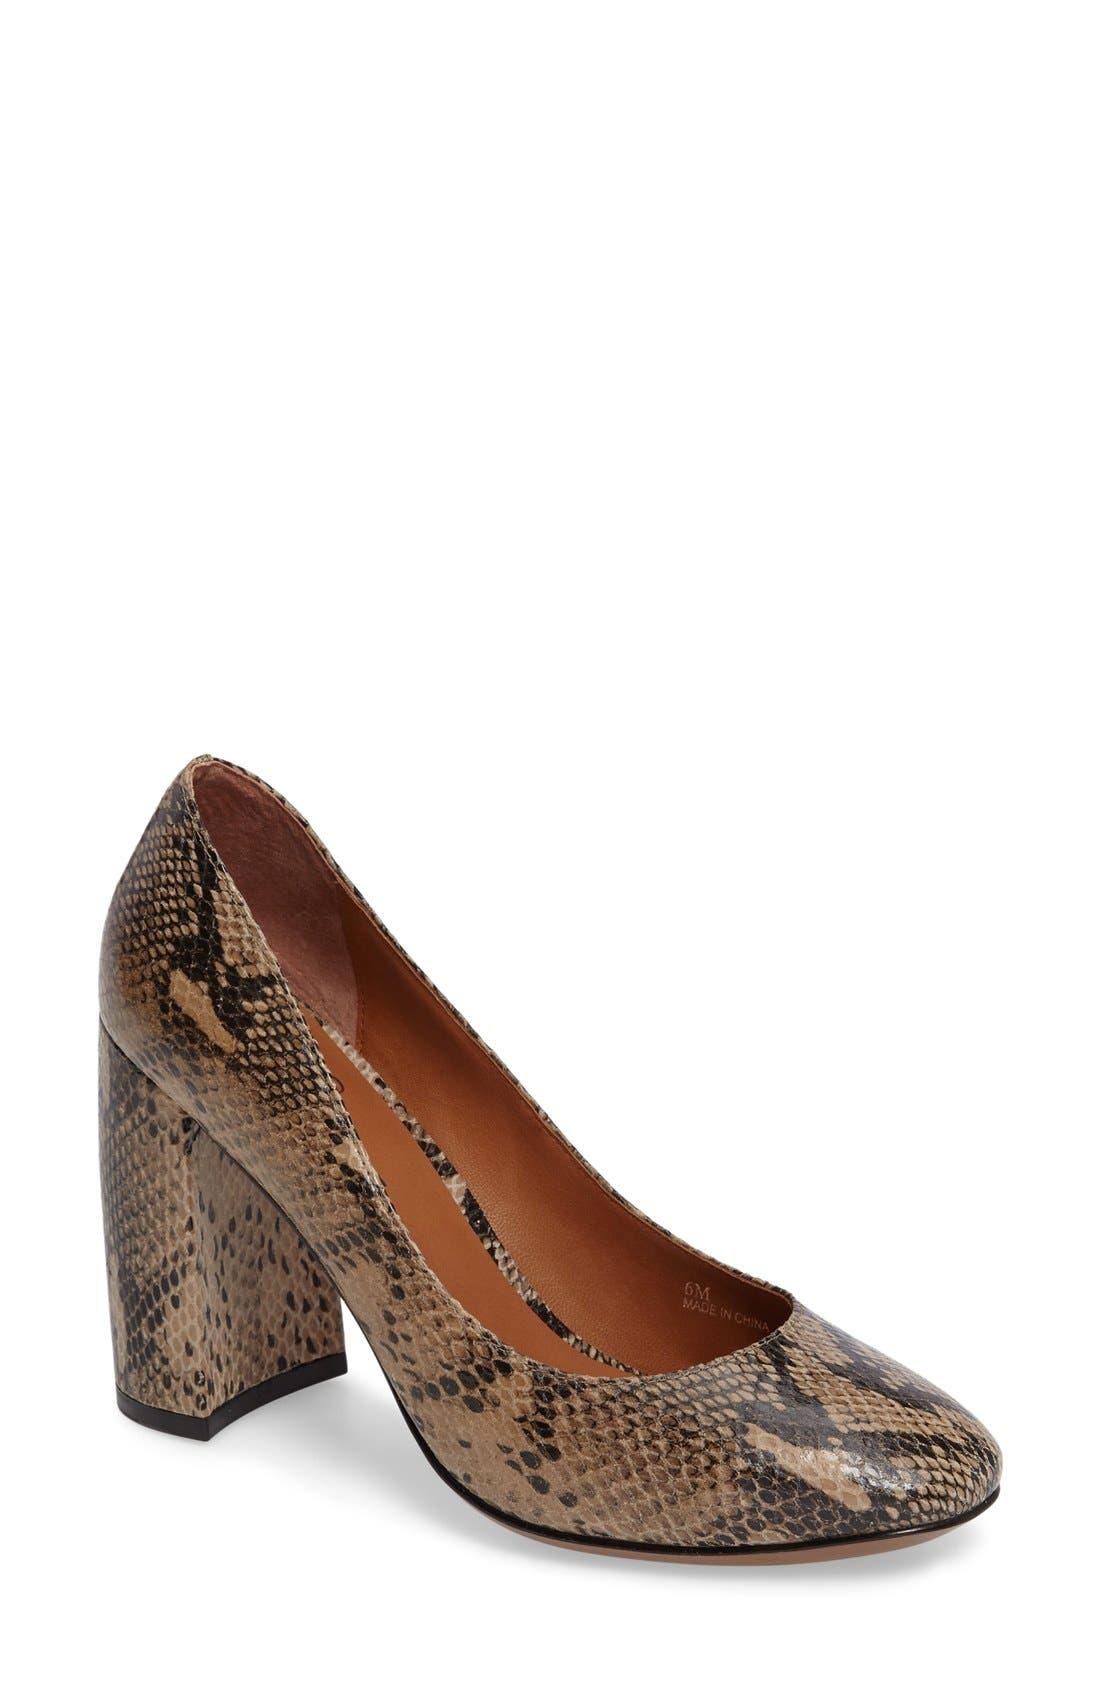 LINEA PAOLO 'Brooke' Block Heel Pump